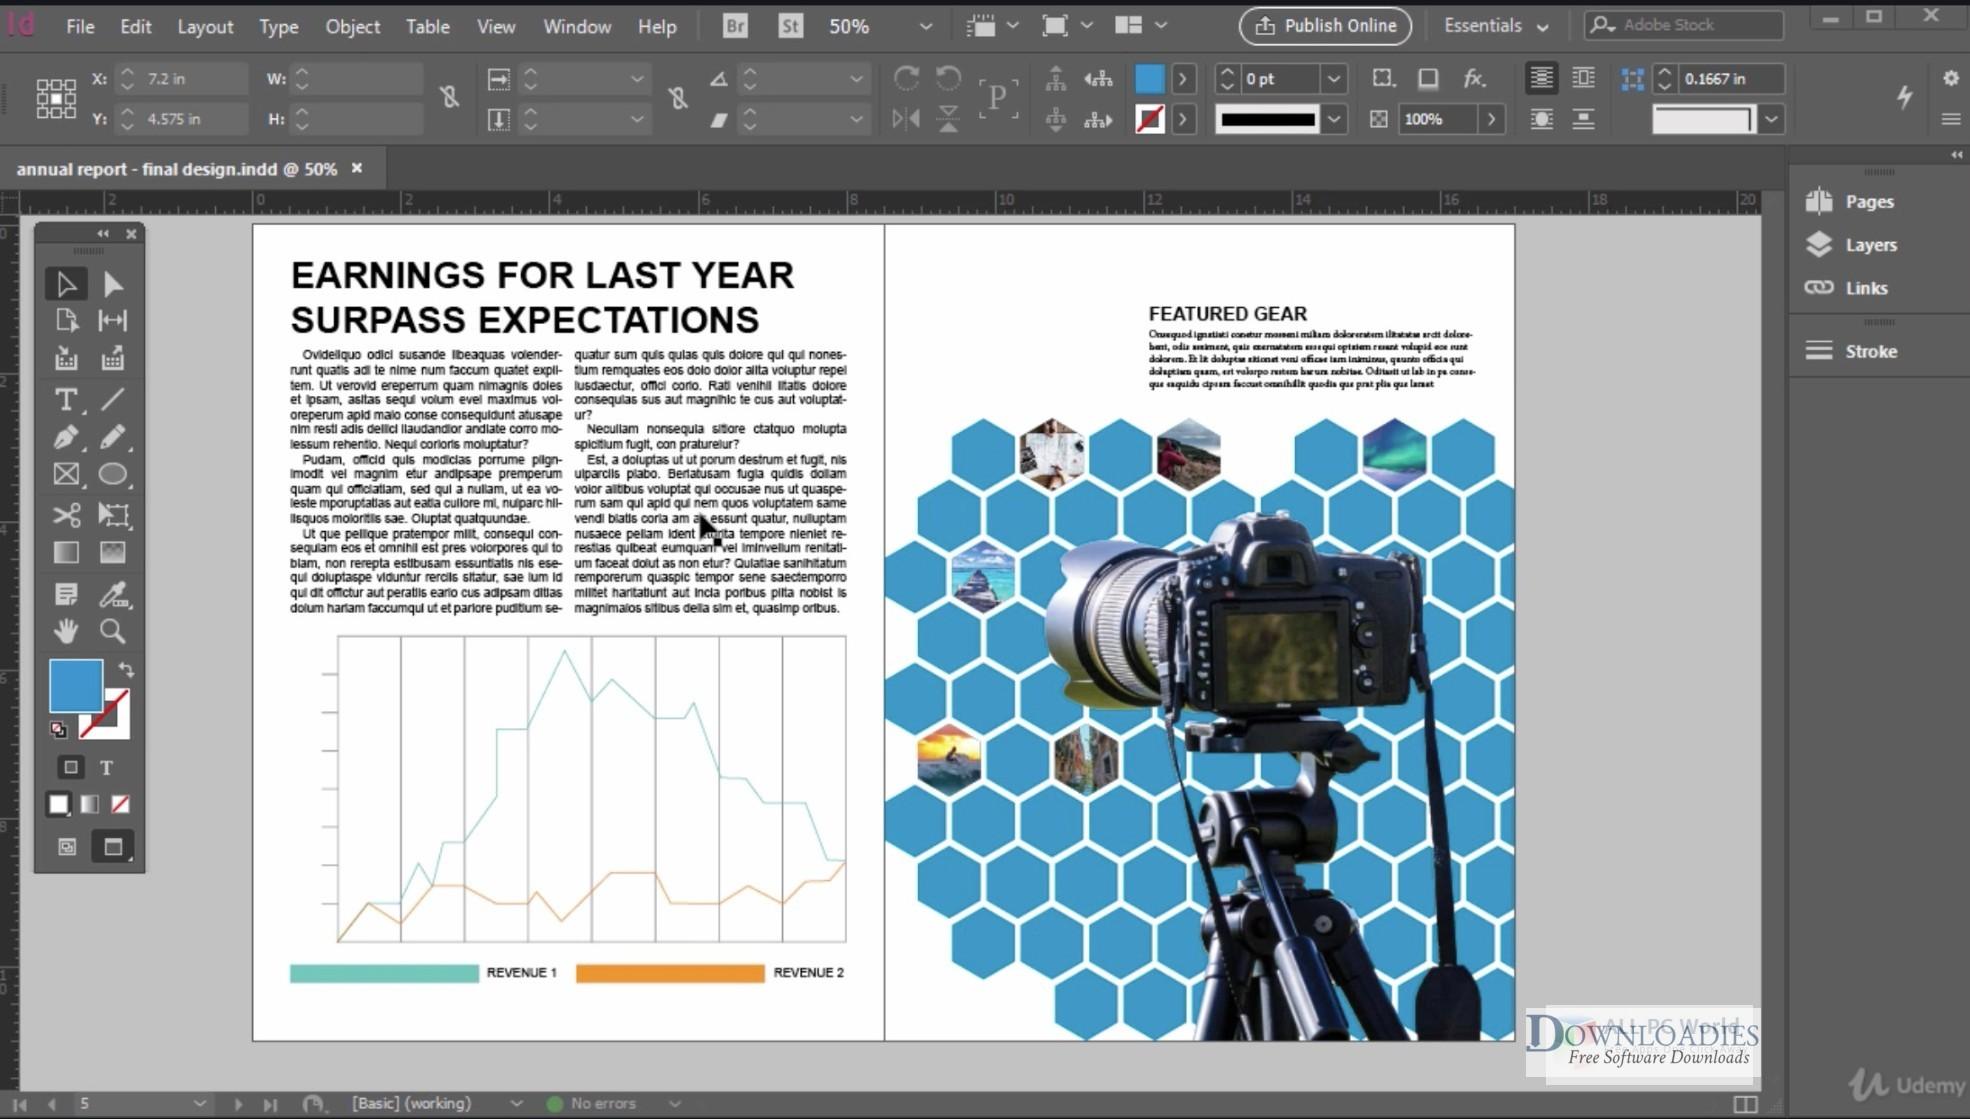 Free Download Adobe InDesign CC 2018 13.0 for Mac downloadies